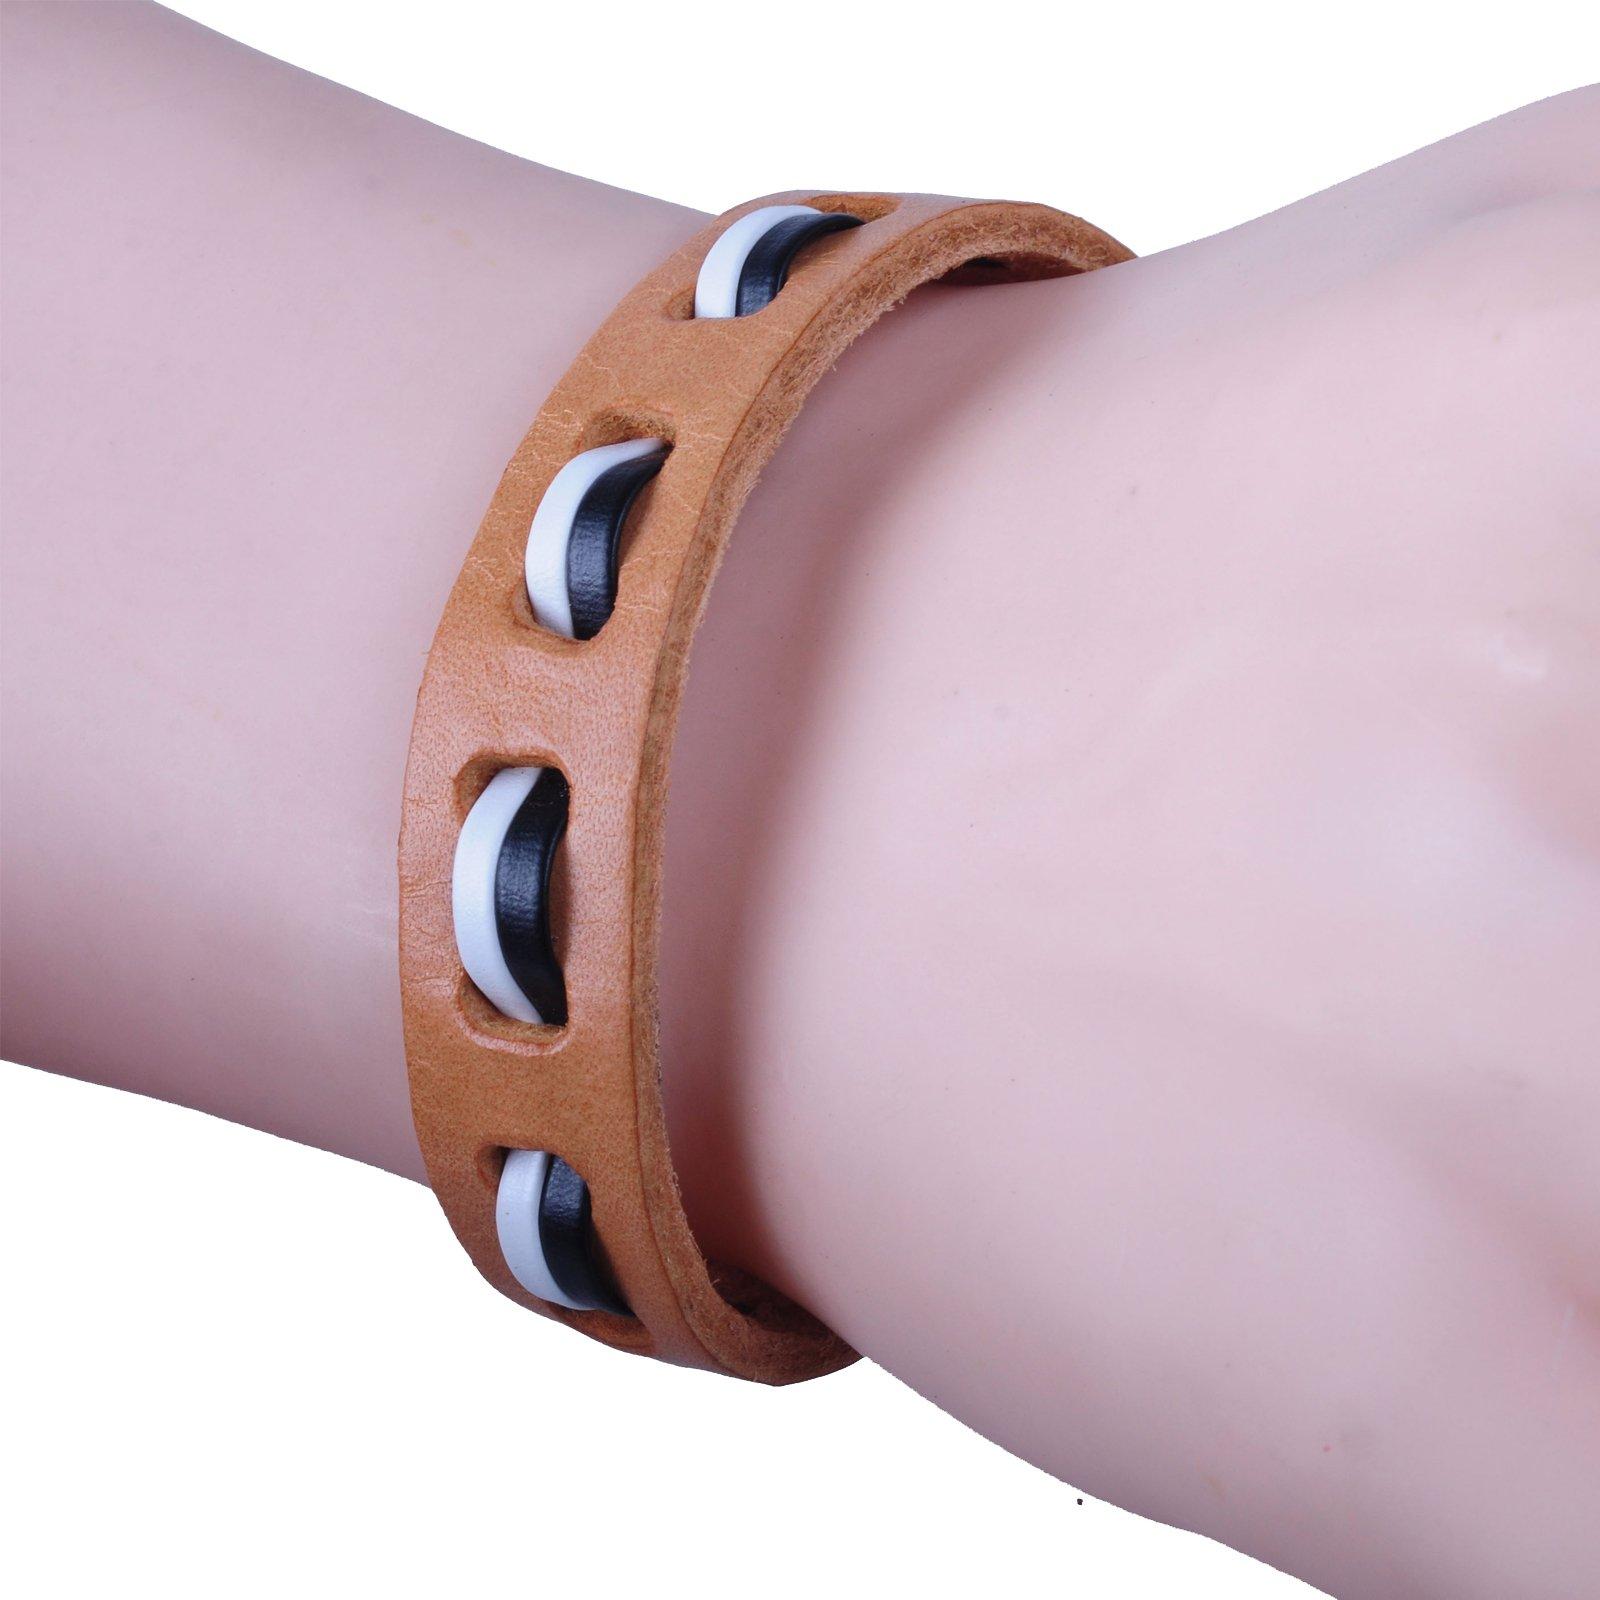 New-Fawn-Orange-Brown-Unisex-Genuine-Leather-Adjustable-Bracelets-Gift-086USANNA miniature 14